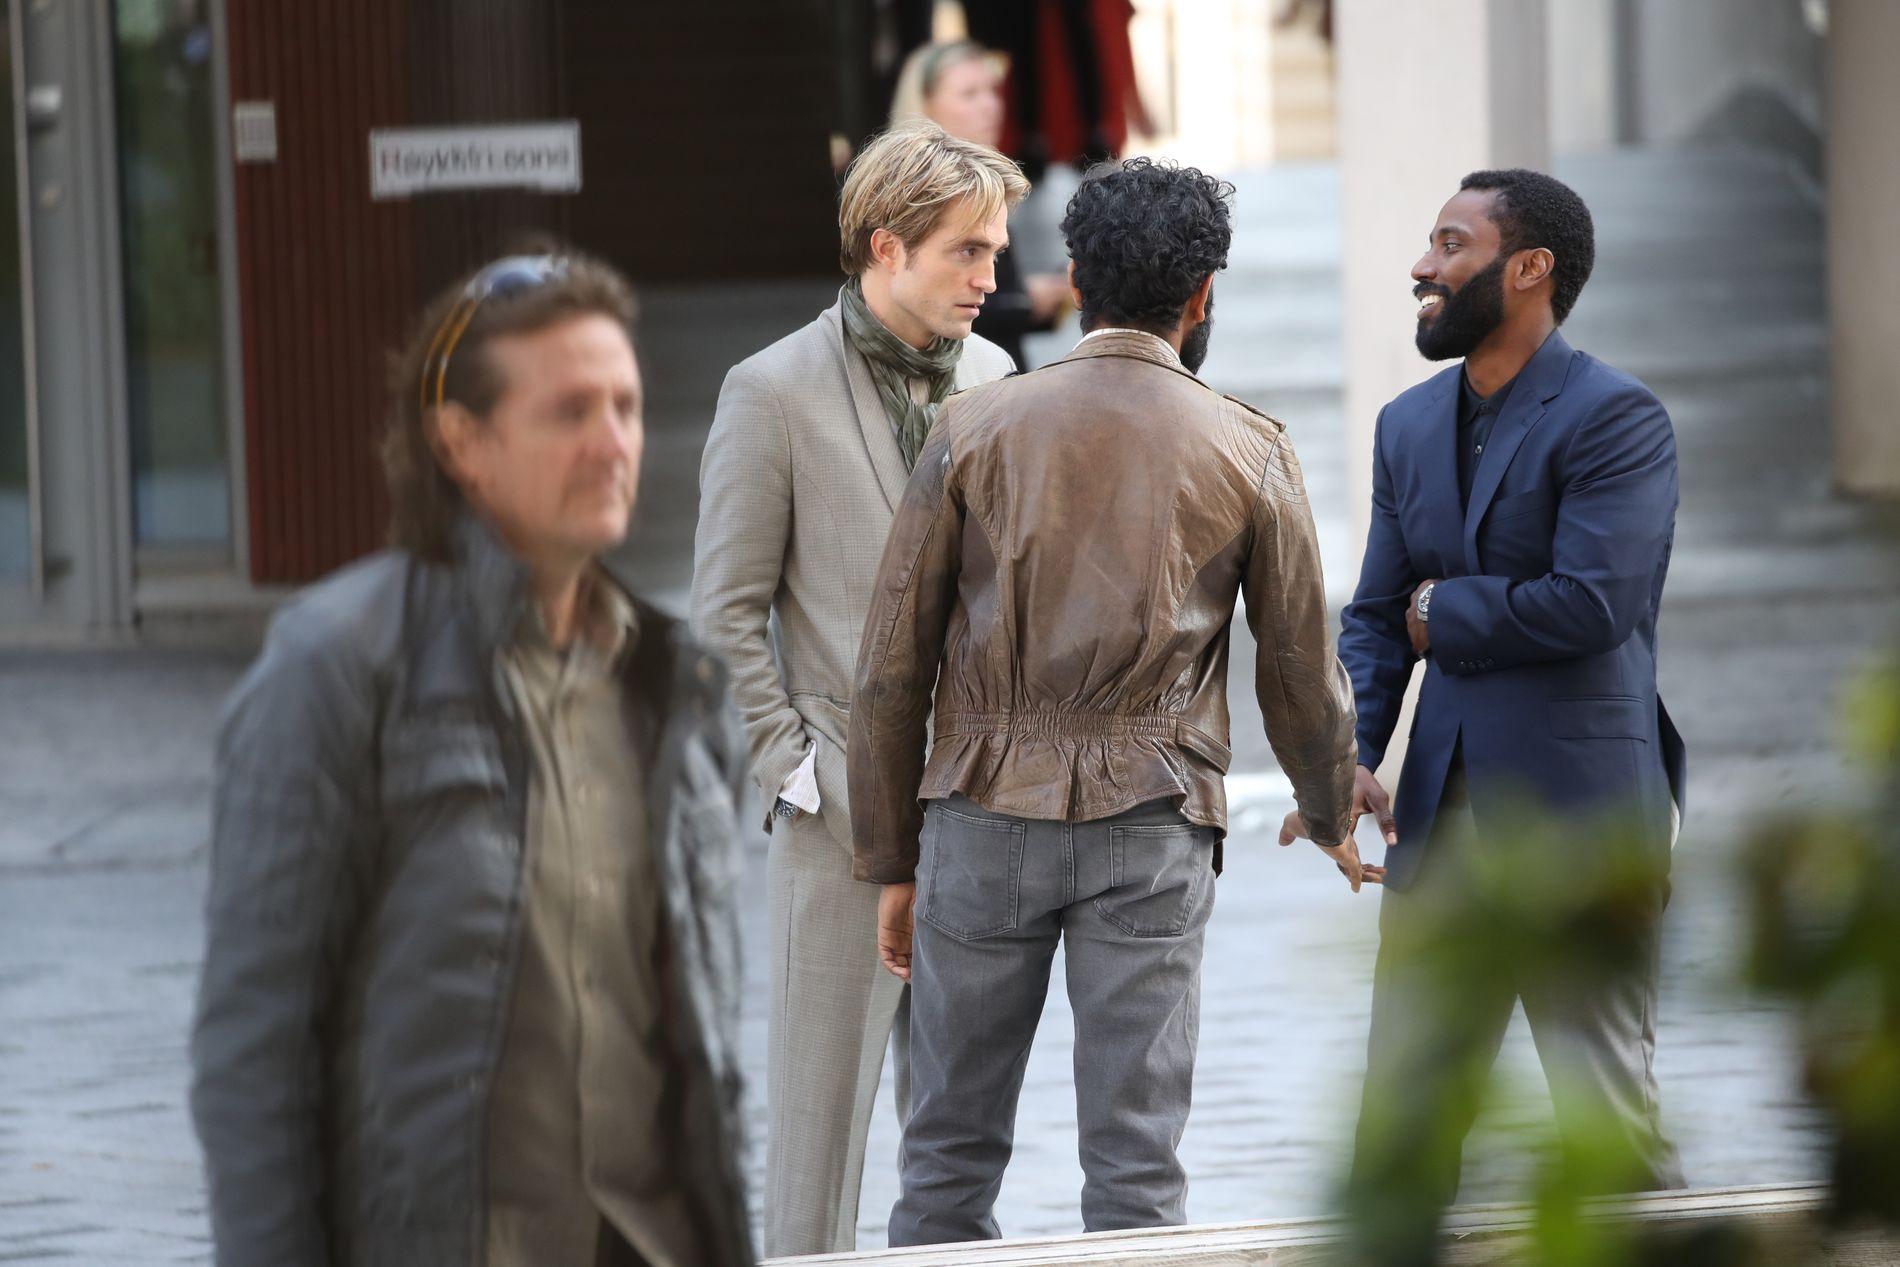 STJERNER: Pattinson i samtale med en skuespiller som kan være John David Washington (t.h).